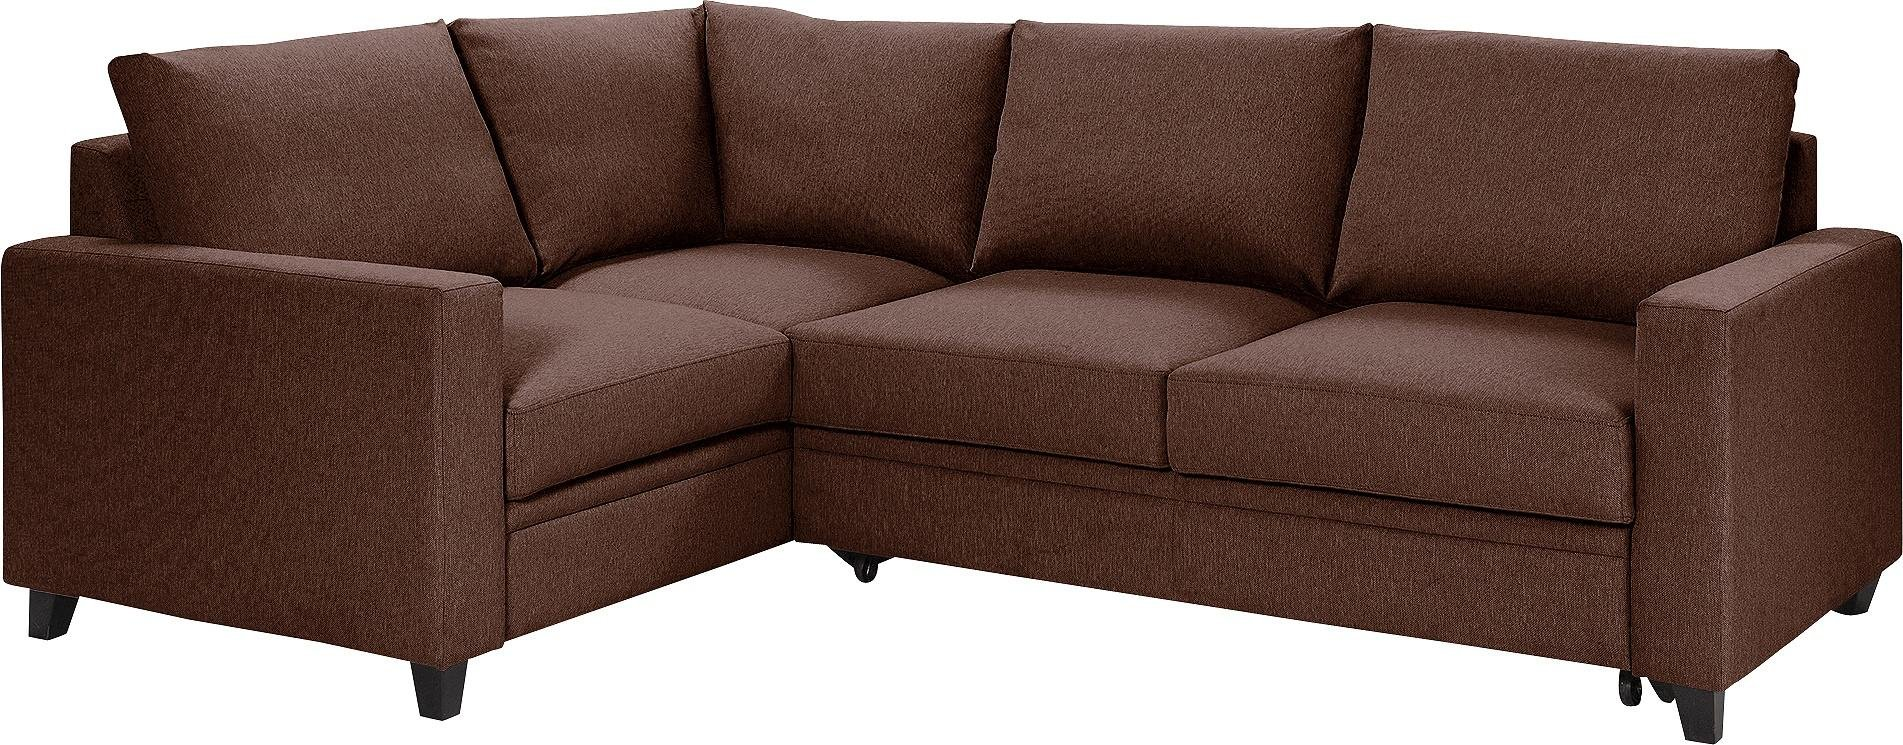 Argos Home - Seattle Fabric Left Hand Corner Sofa Bed - Brown at Argos